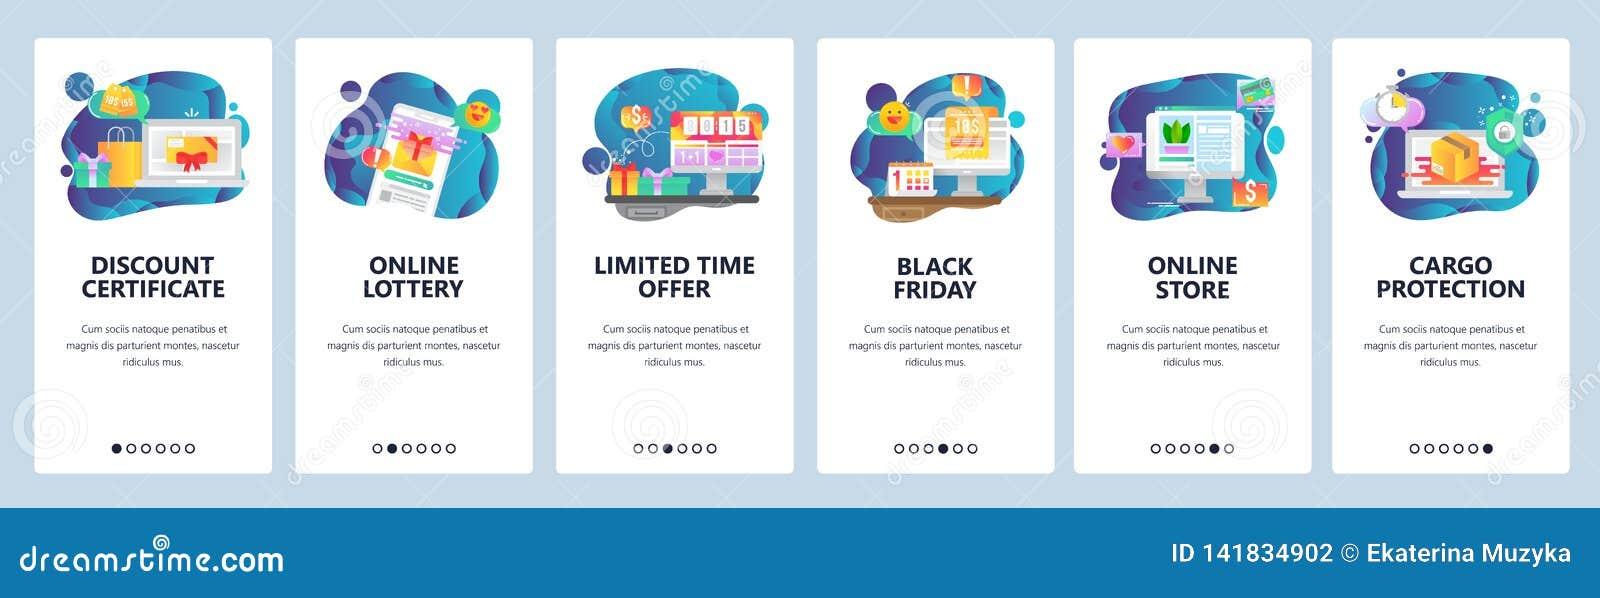 Mobile App Onboarding Screens  Online Shopping, Black Friday